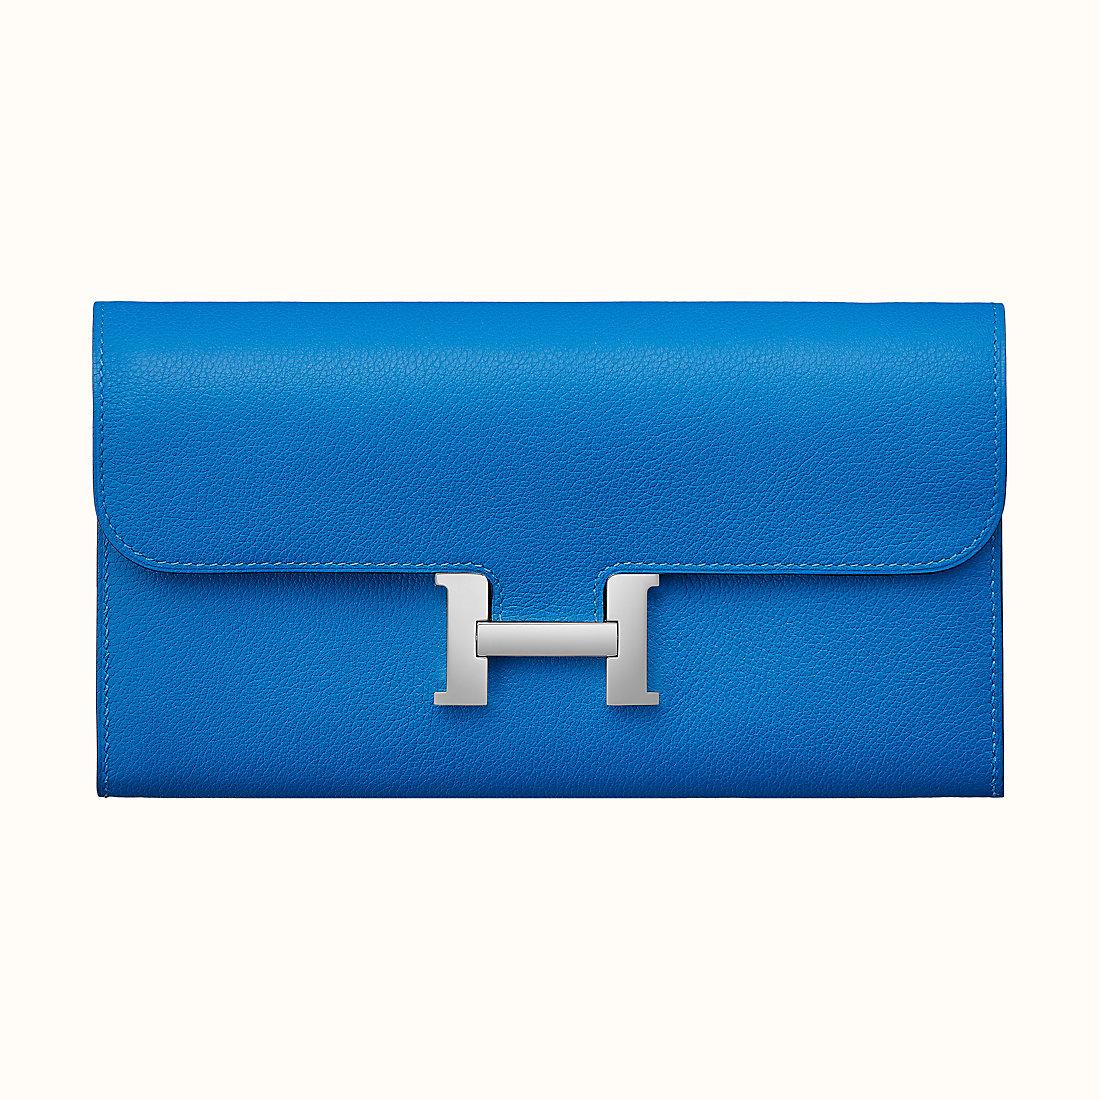 Hong Kong Hermes Portafoglio Constance Long Evercolor T7 Bleu Hydra